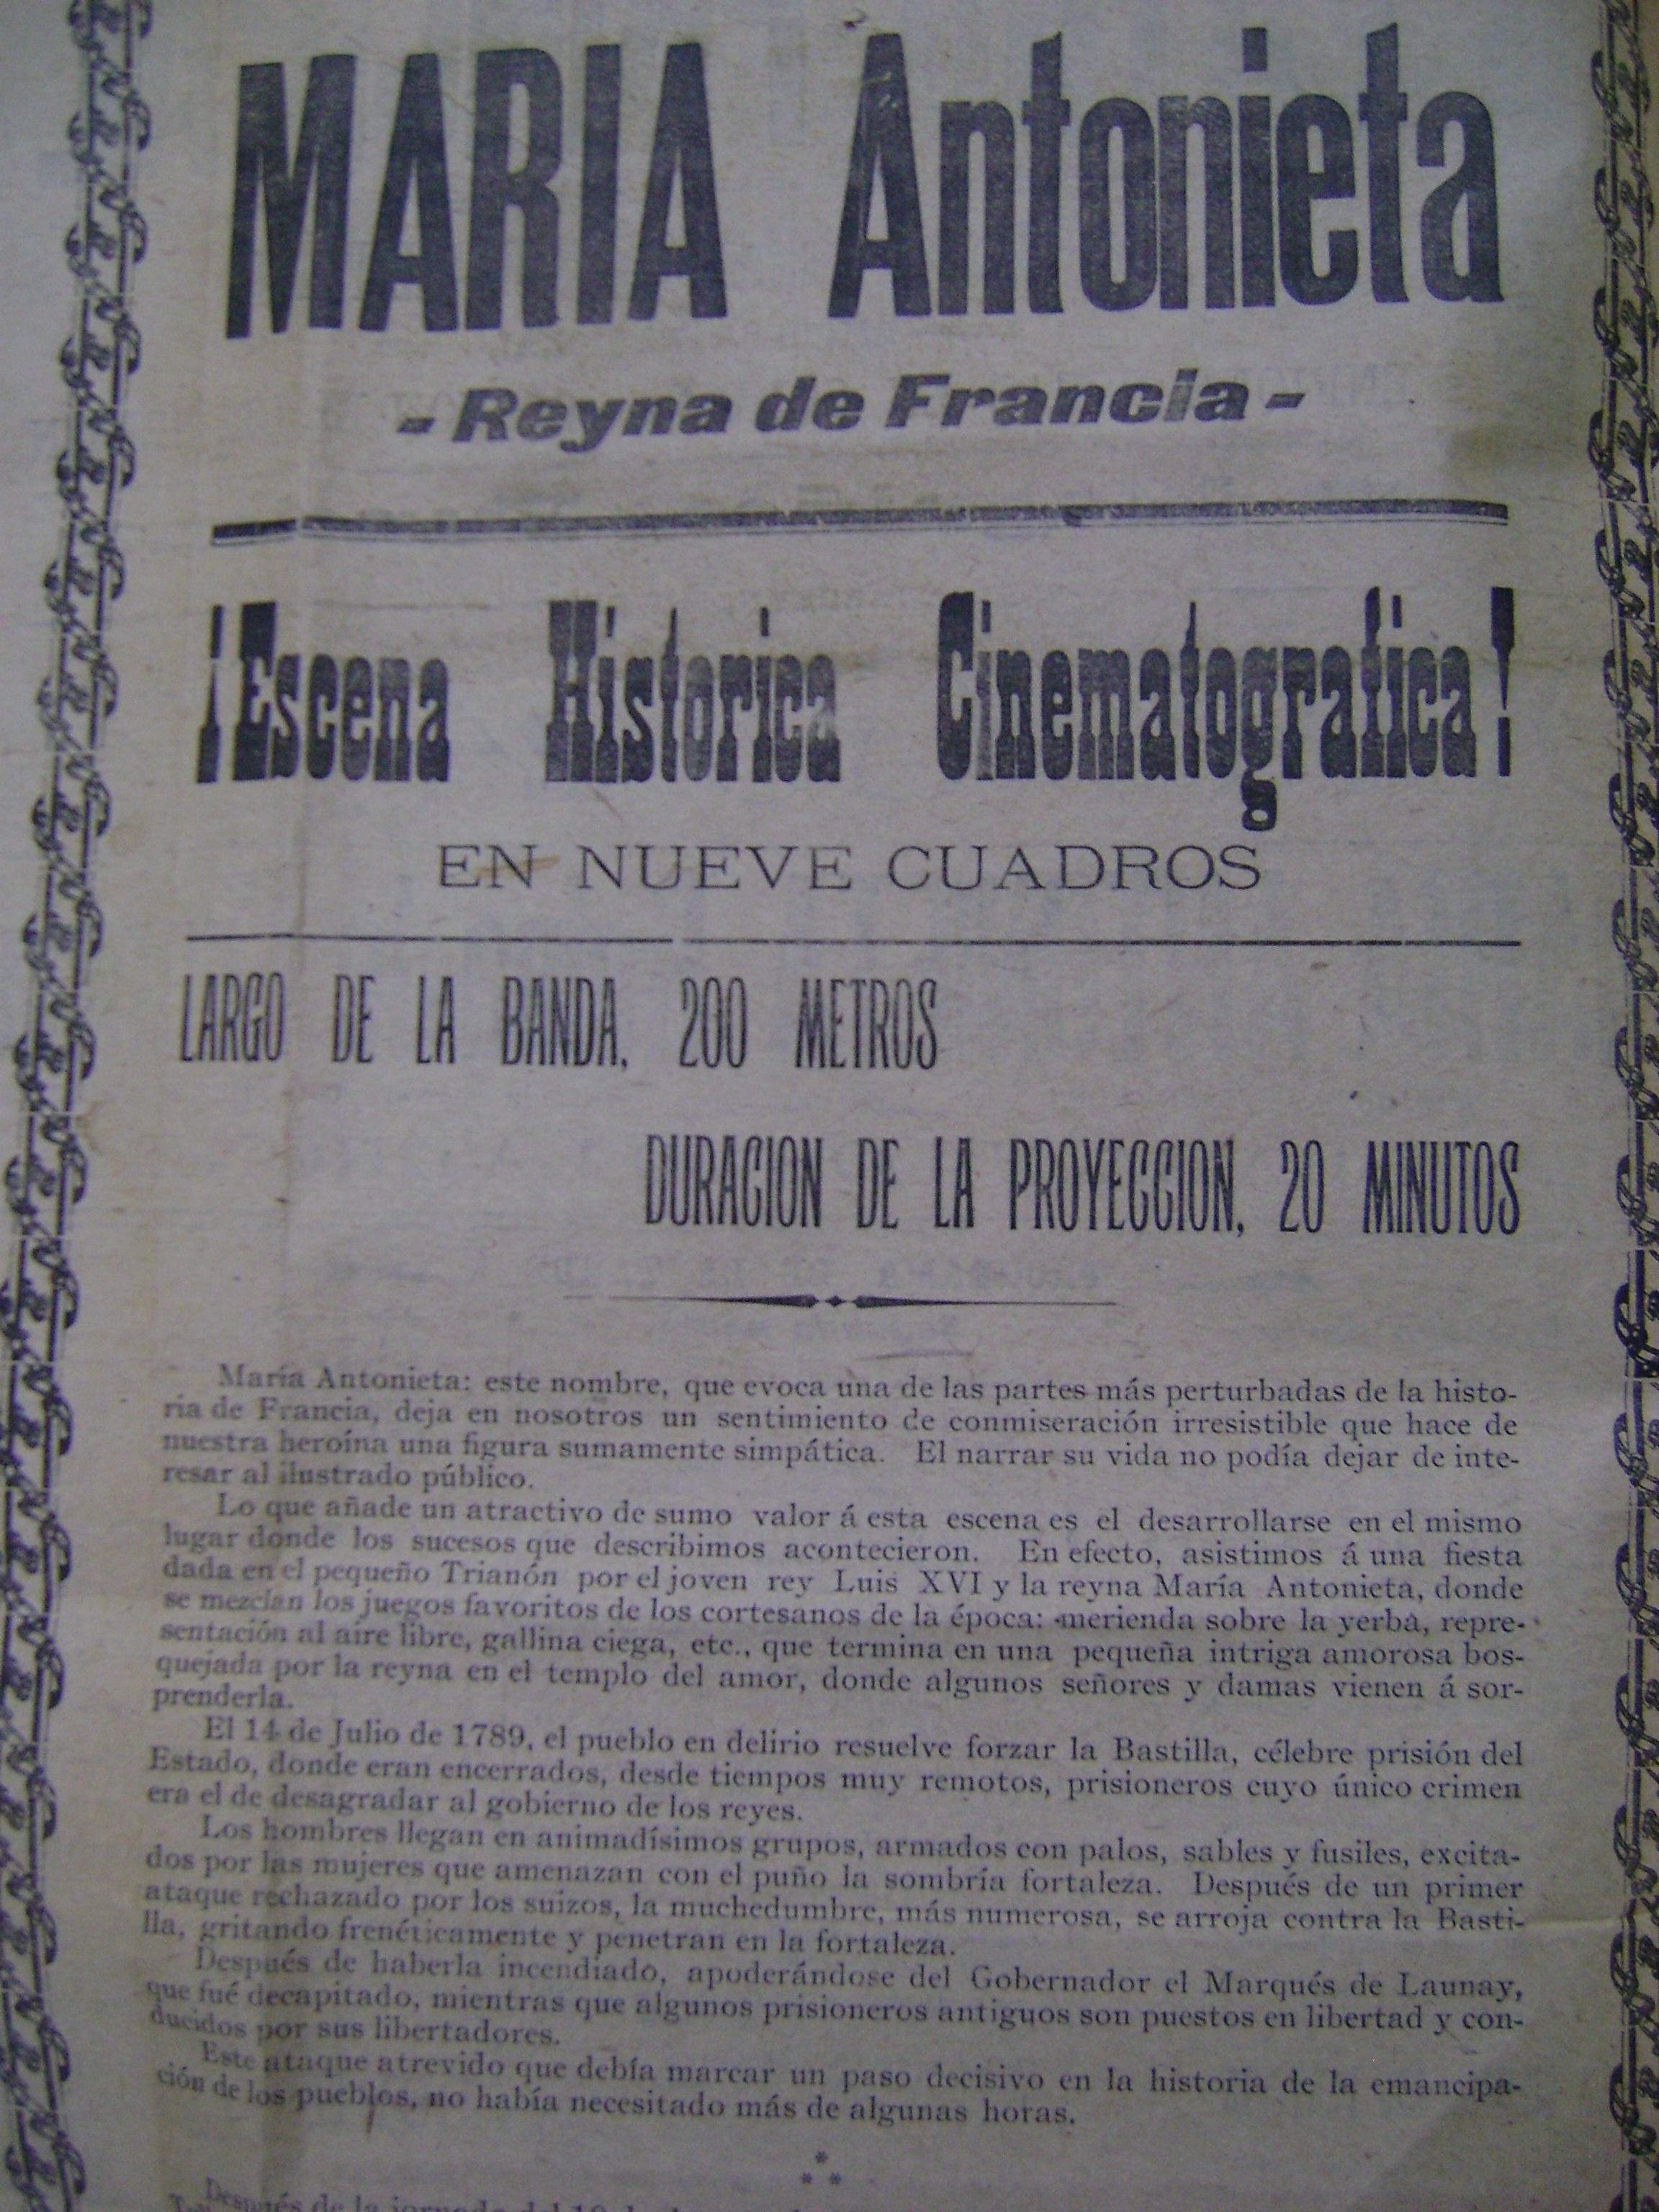 Reverso del cartes del 24 de julio de 1904